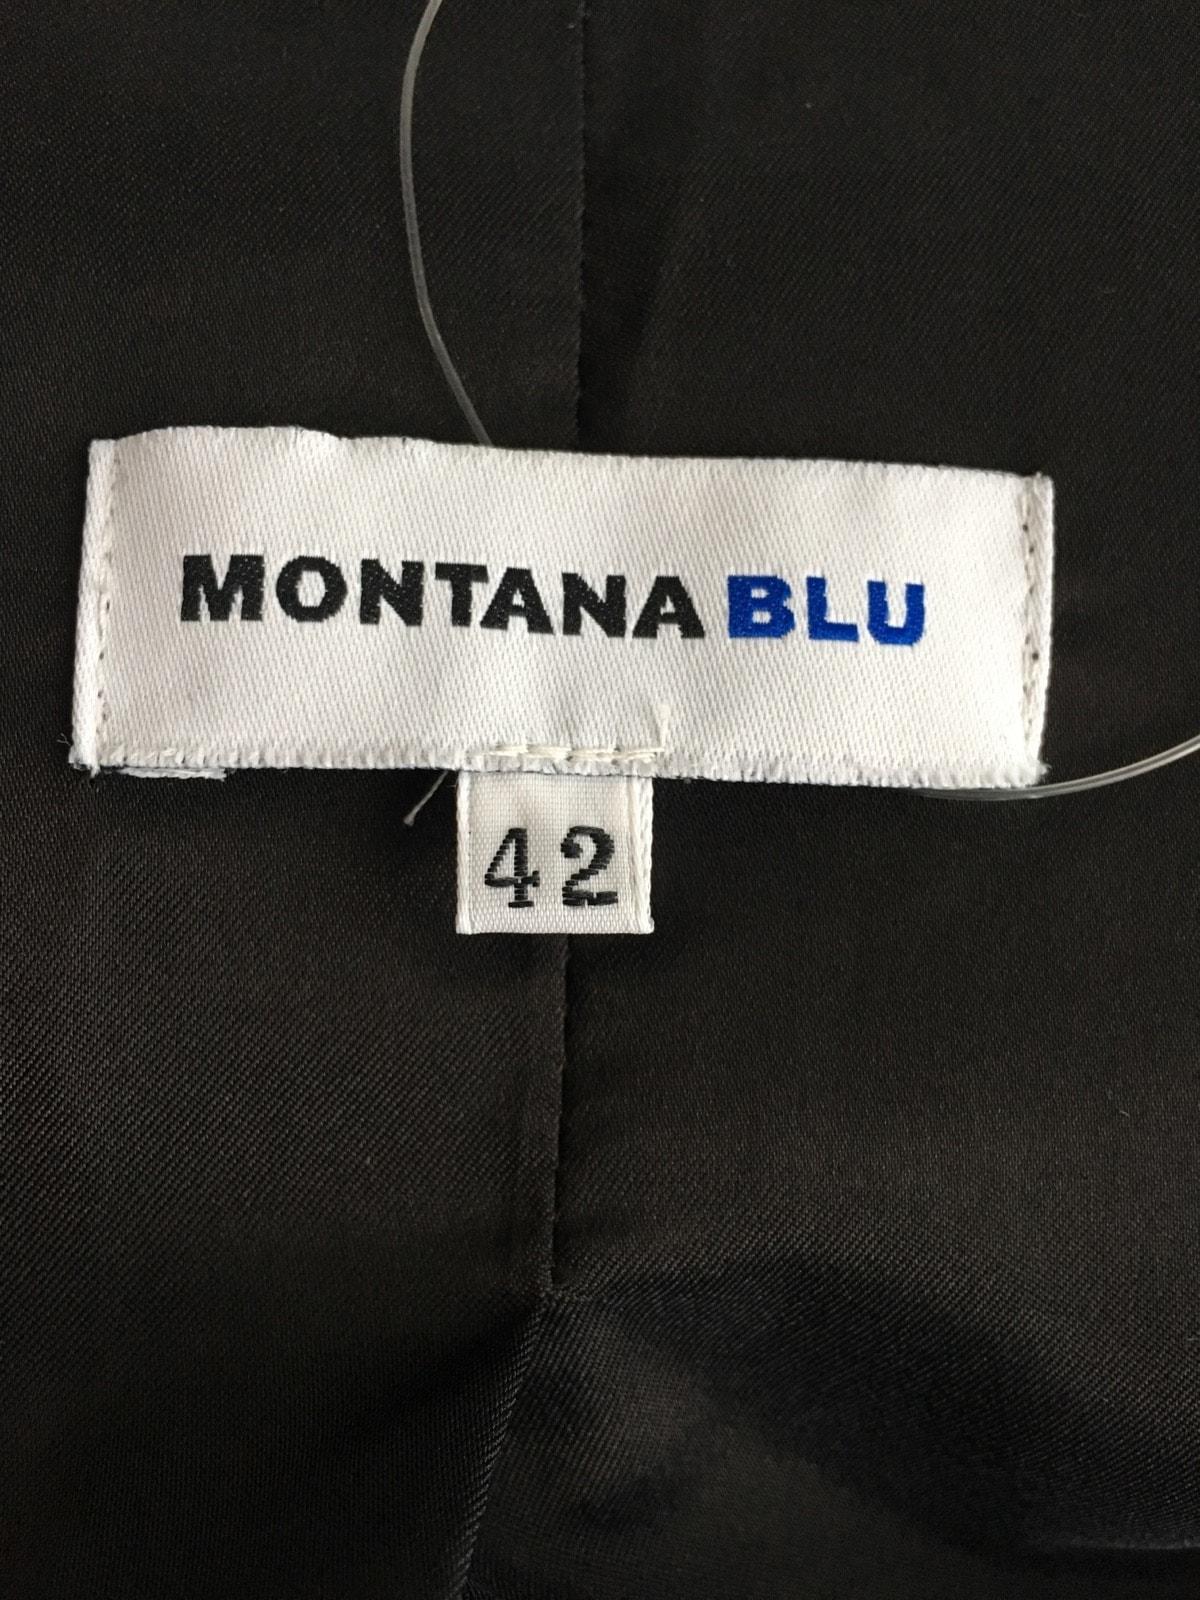 MONTANABLU(モンタナブルー)のレディースパンツスーツ